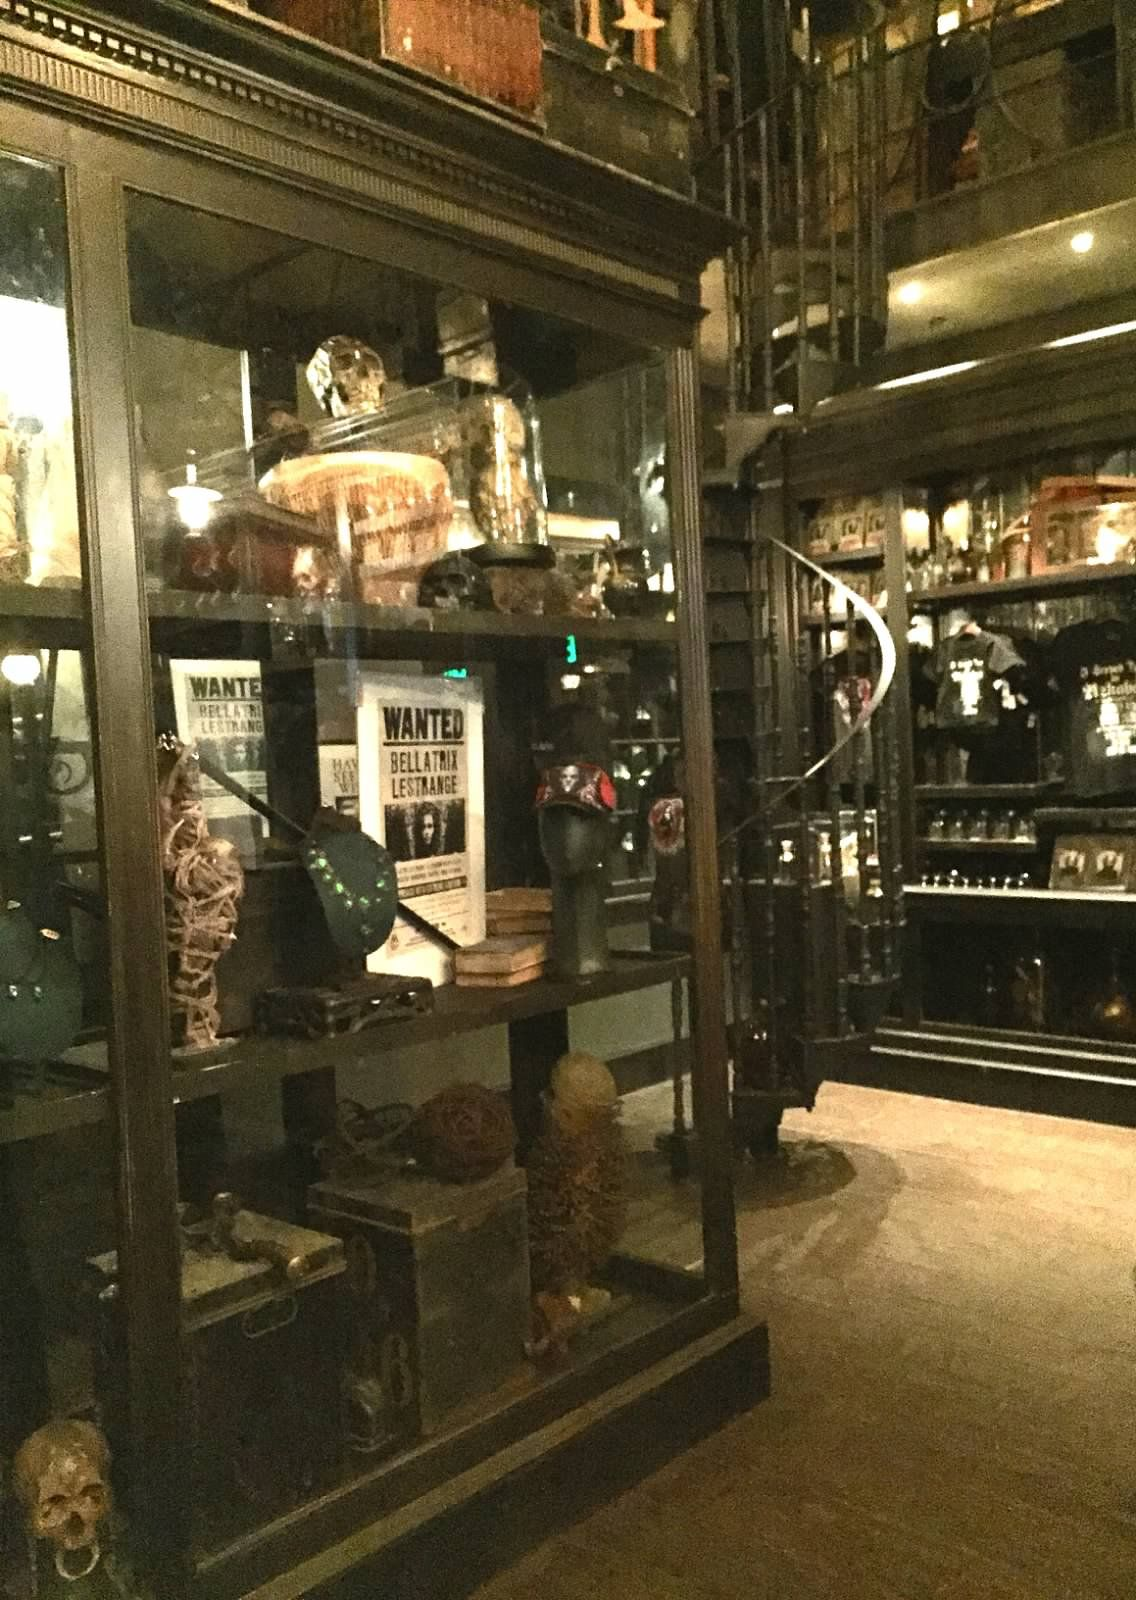 Borgin And Burkes In Knockturn Alley Harry Potter Decor Harry Potter Diagon Alley Harry Potter Places